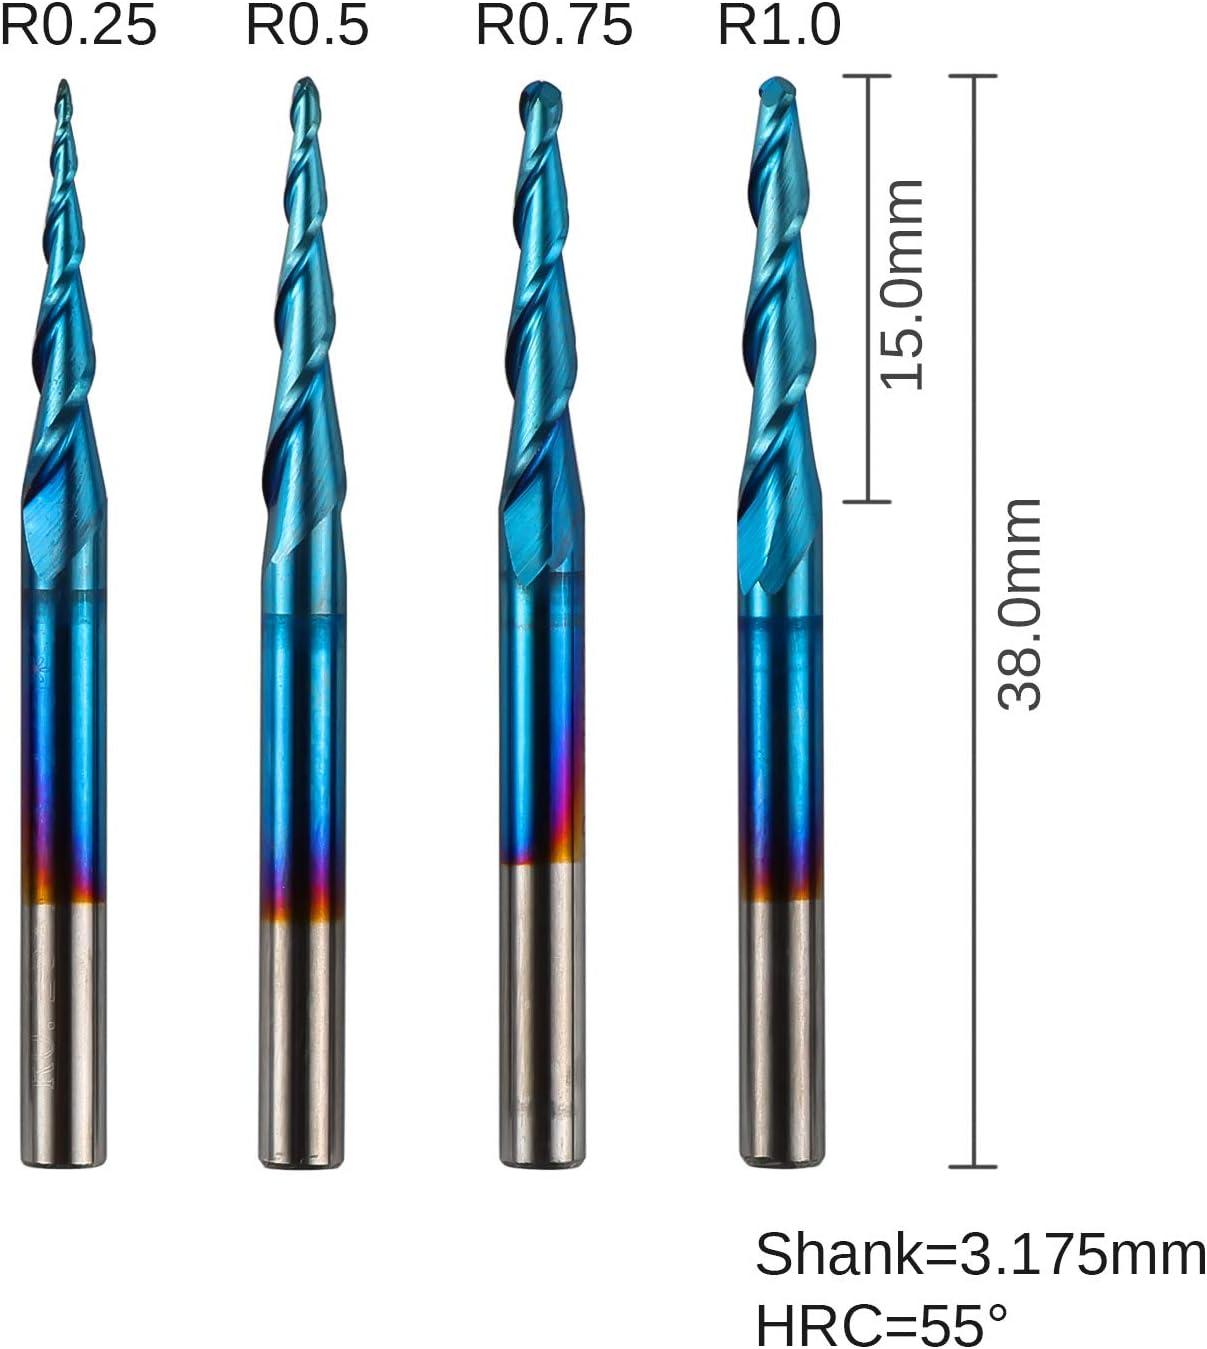 3 mm Shank Diameter 38 mm Length Titanium Nitride Coating 4.5 mm Cutting Length 1.5 mm Cutting Diameter SGS 48629 3M 2 Flute Square End General Purpose End Mill